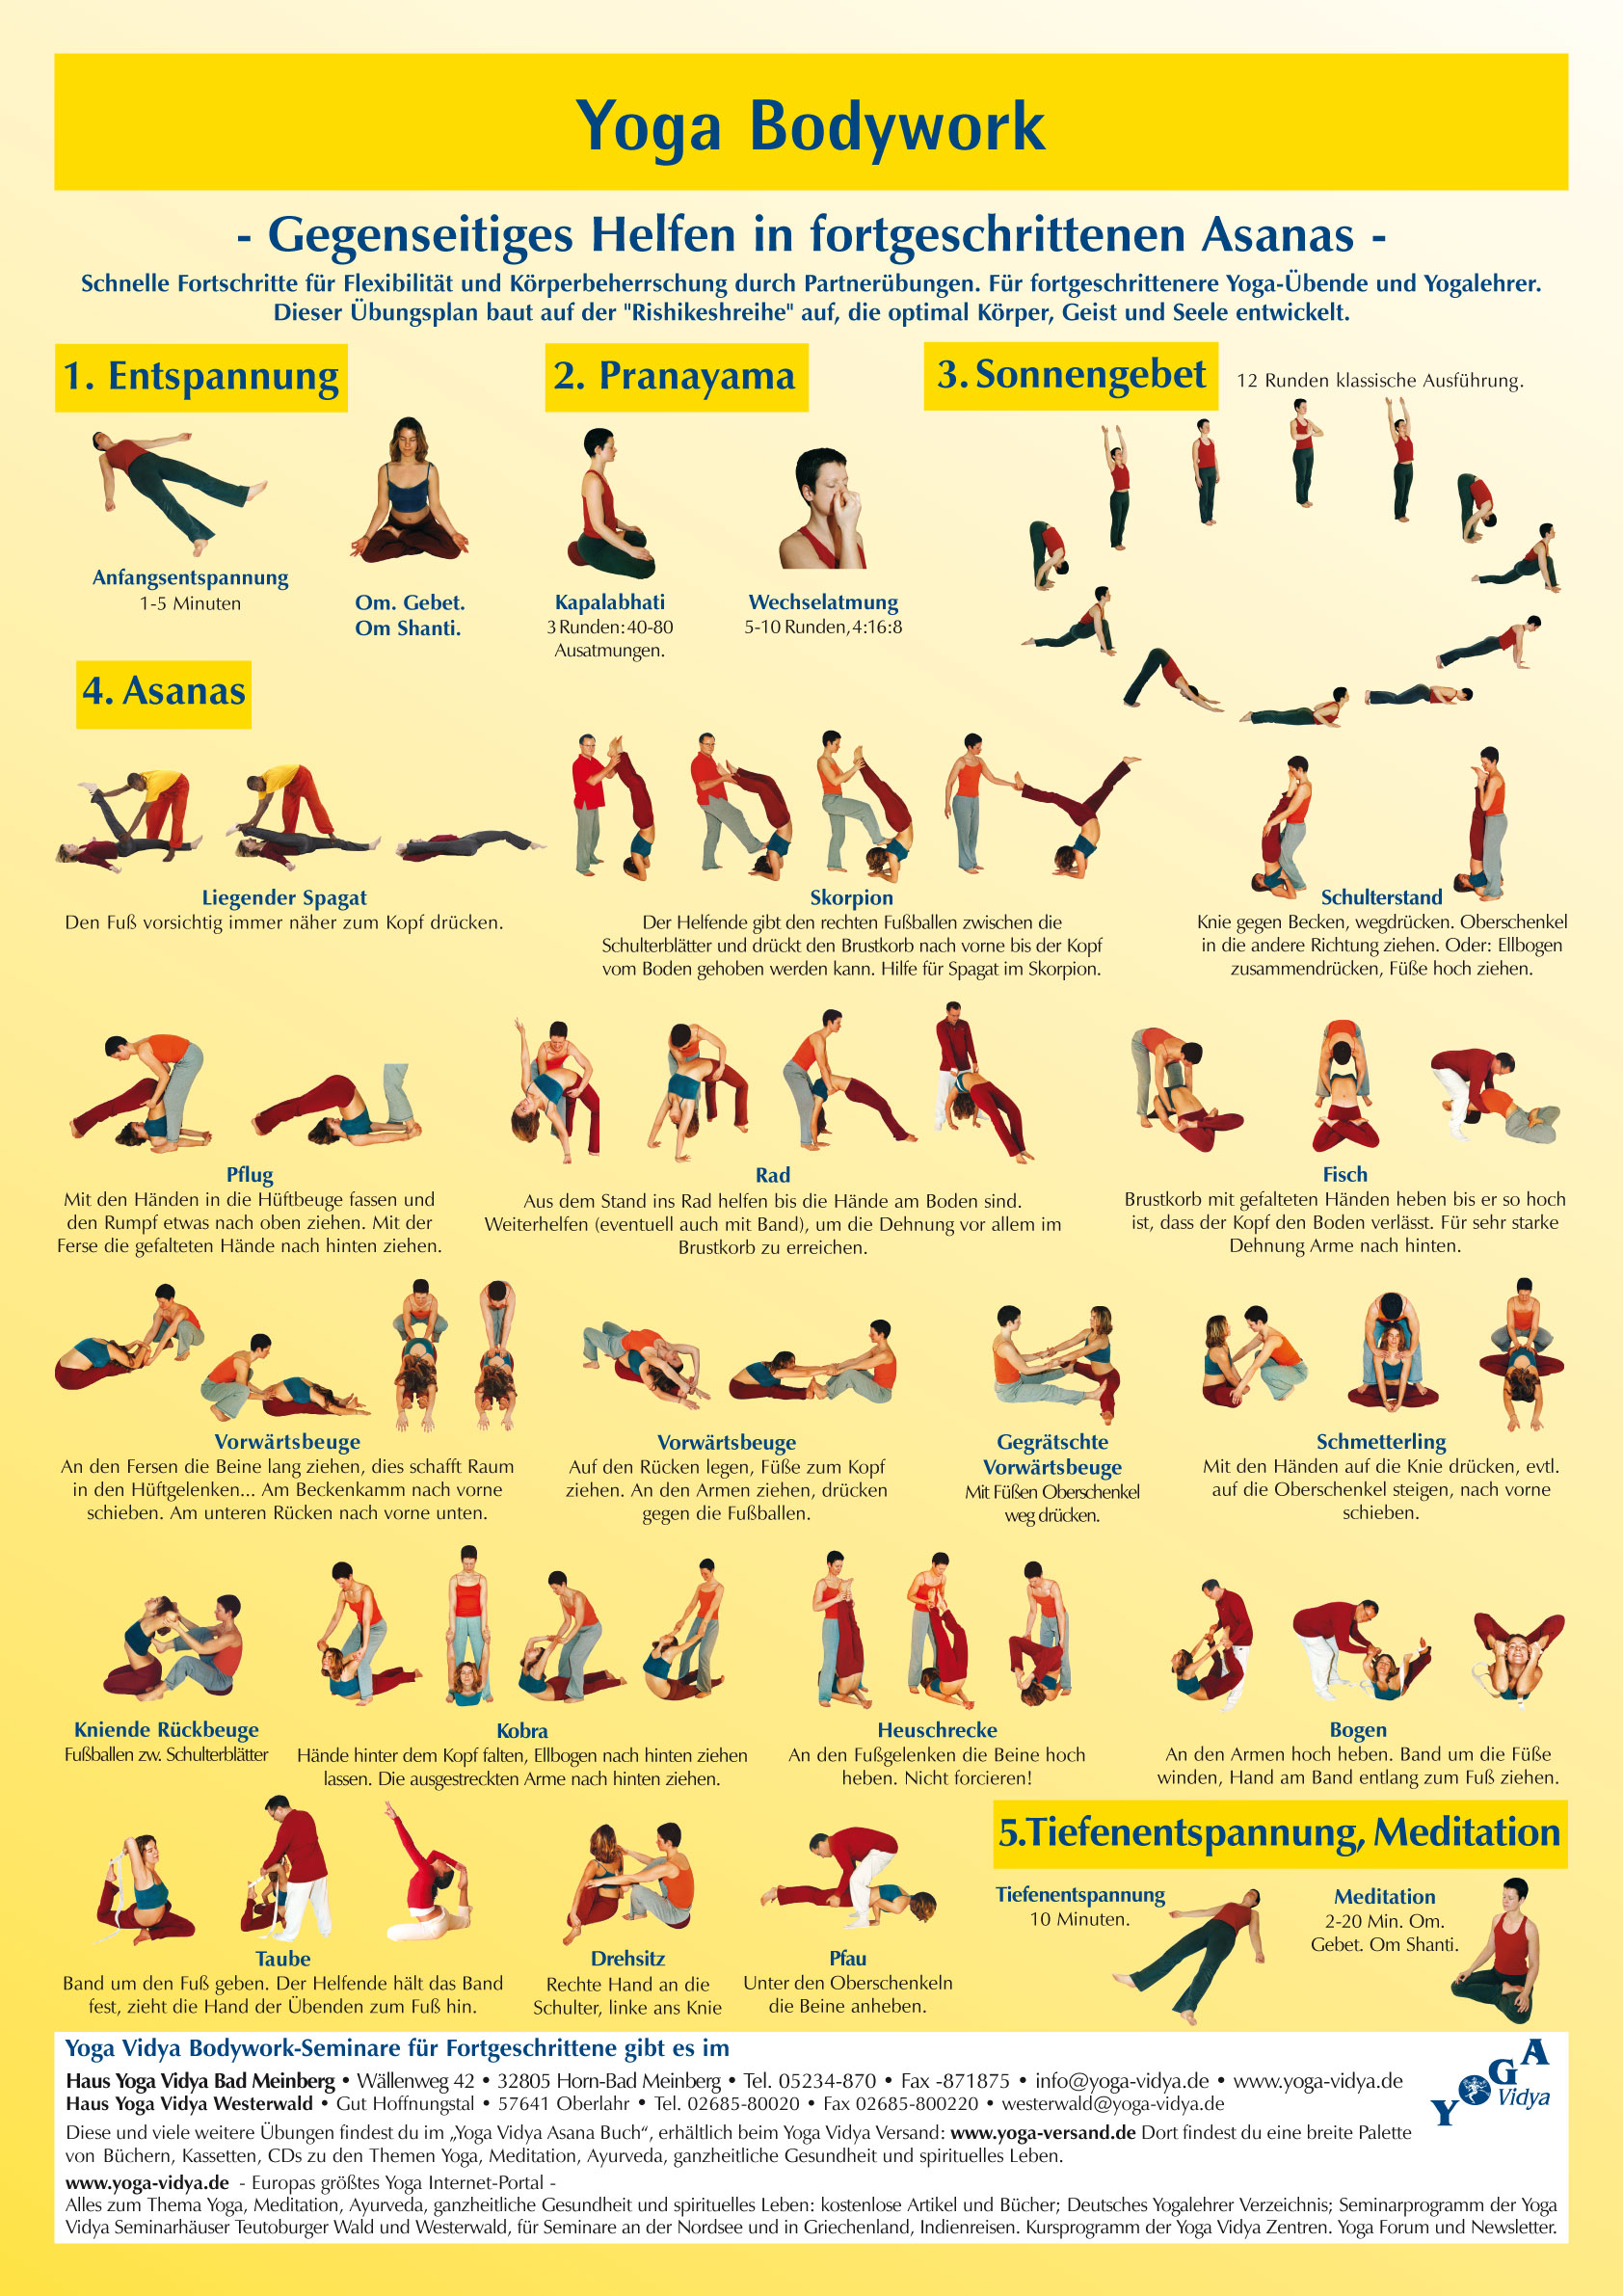 Yoga Bodywork Poster A1